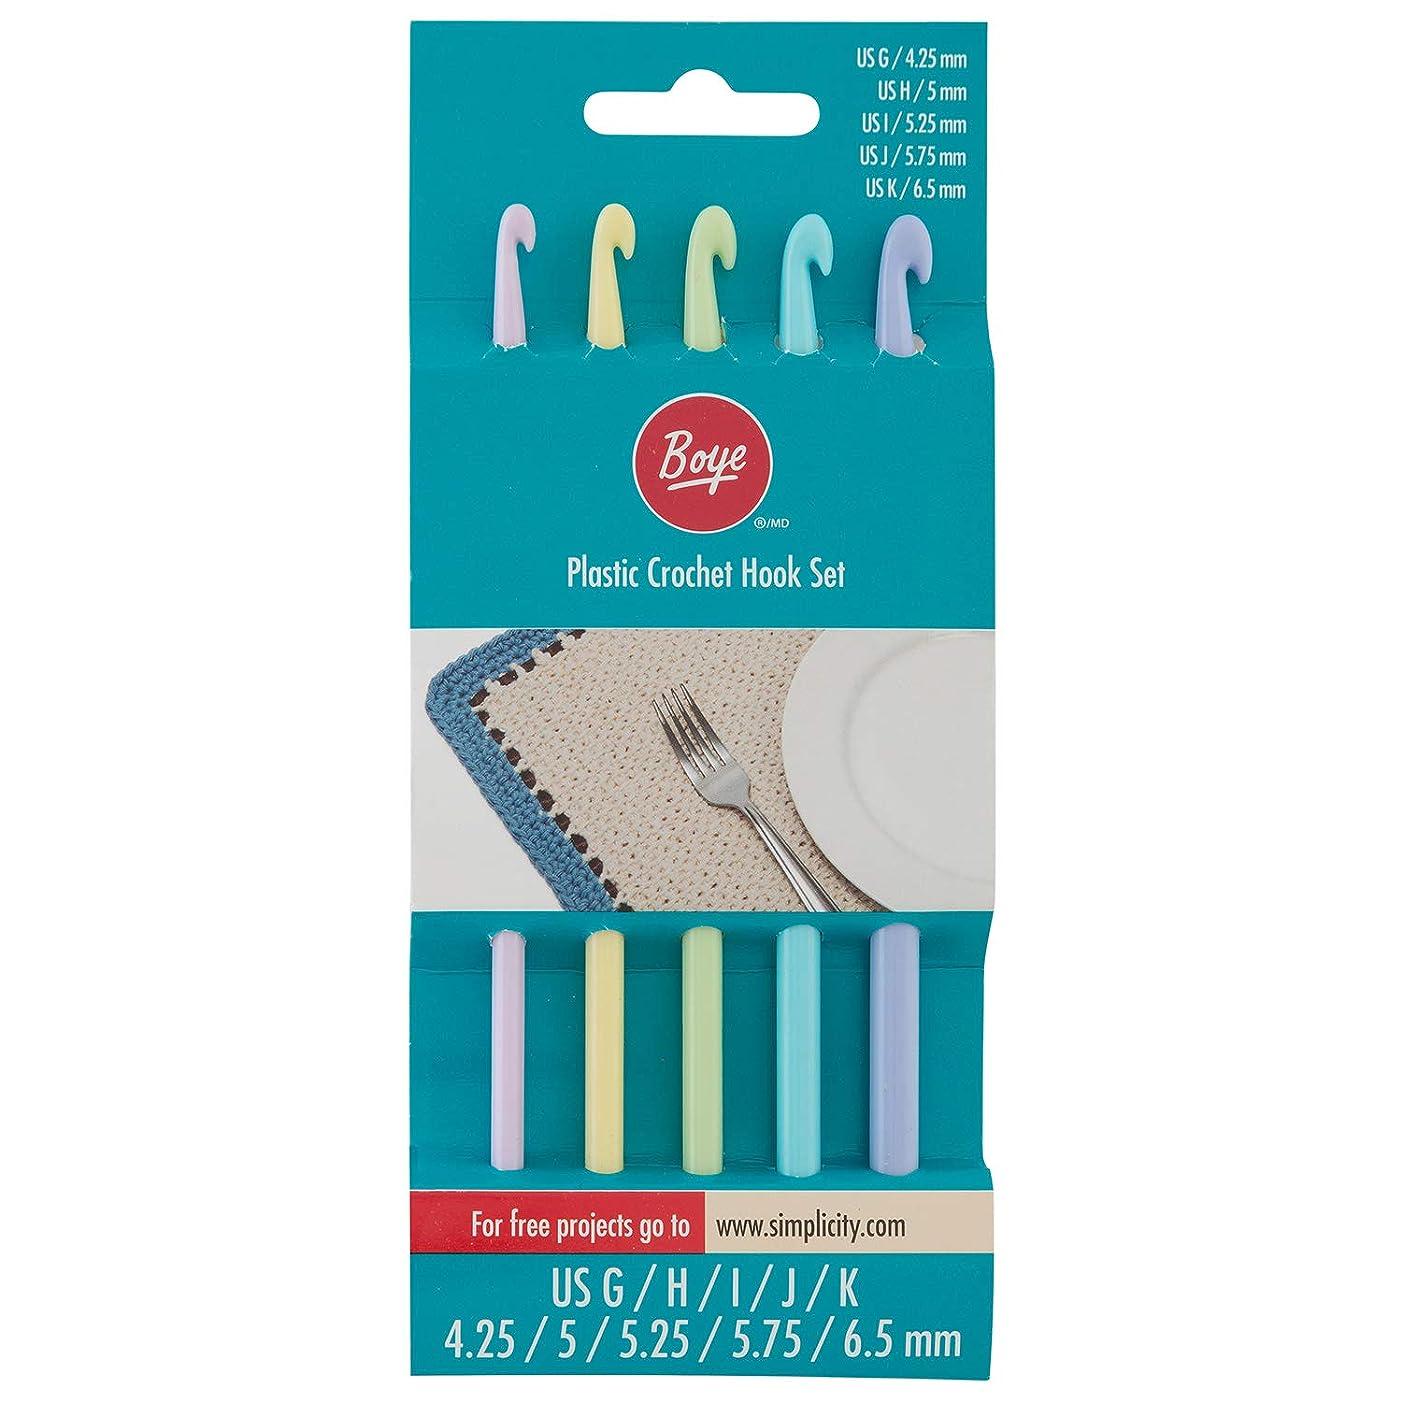 Boye 3336234001WA Plastic Crochet Hook Set, 6pc, US Sizes G, H, I, J, and K, 6 Piece